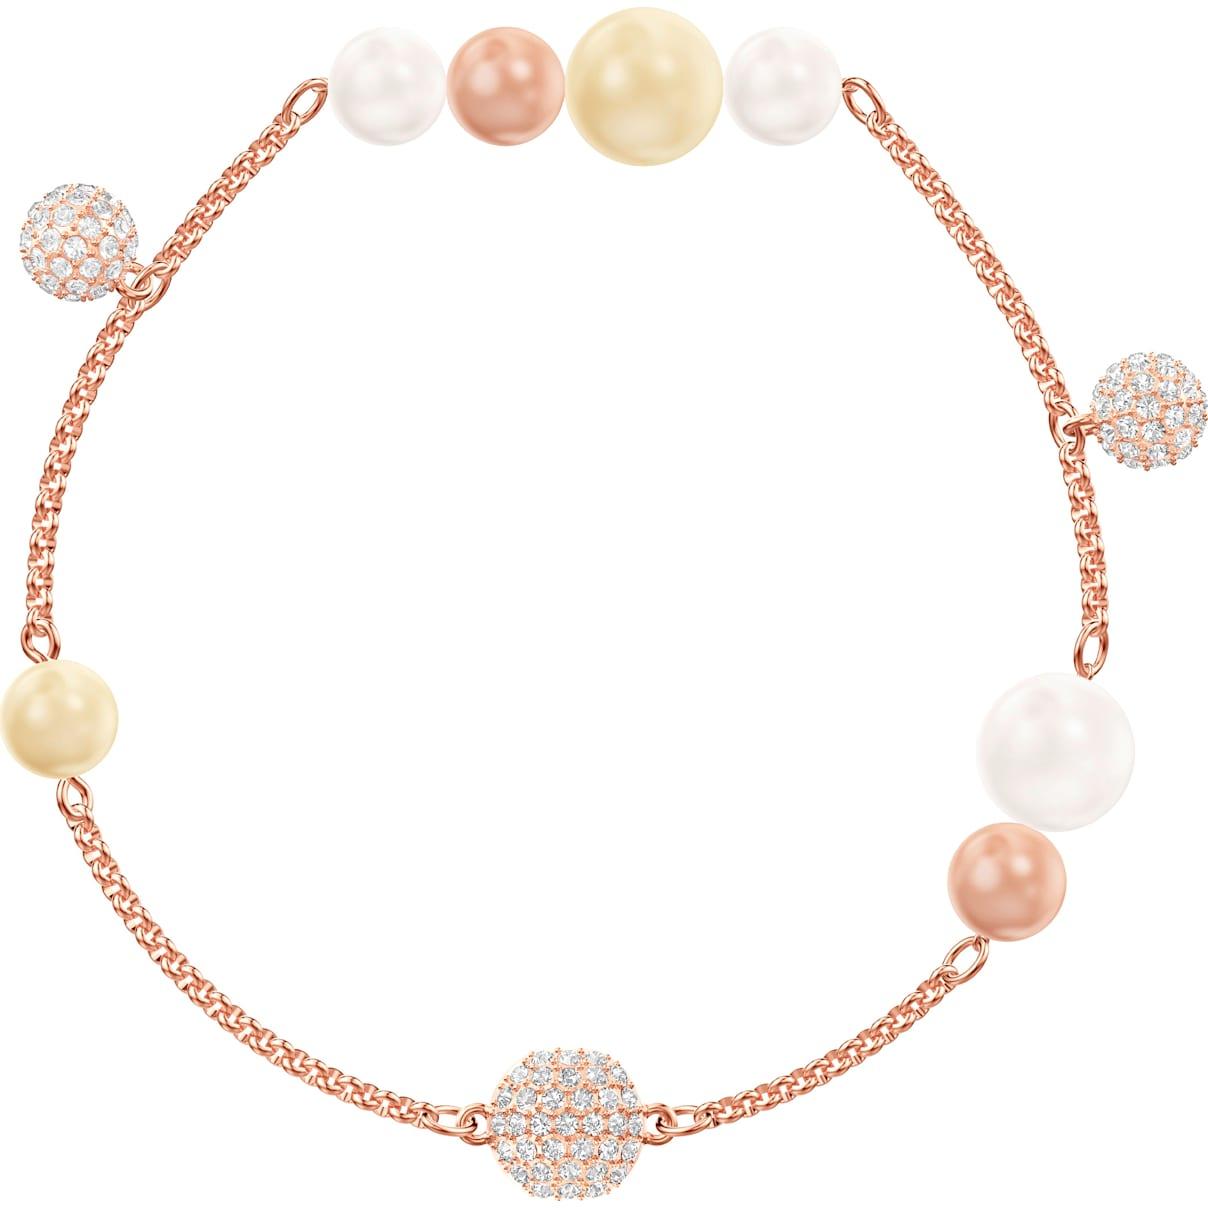 Swarovski Swarovski Remix Collection Pearl Strand, Multi-colored, Rose-gold tone plated